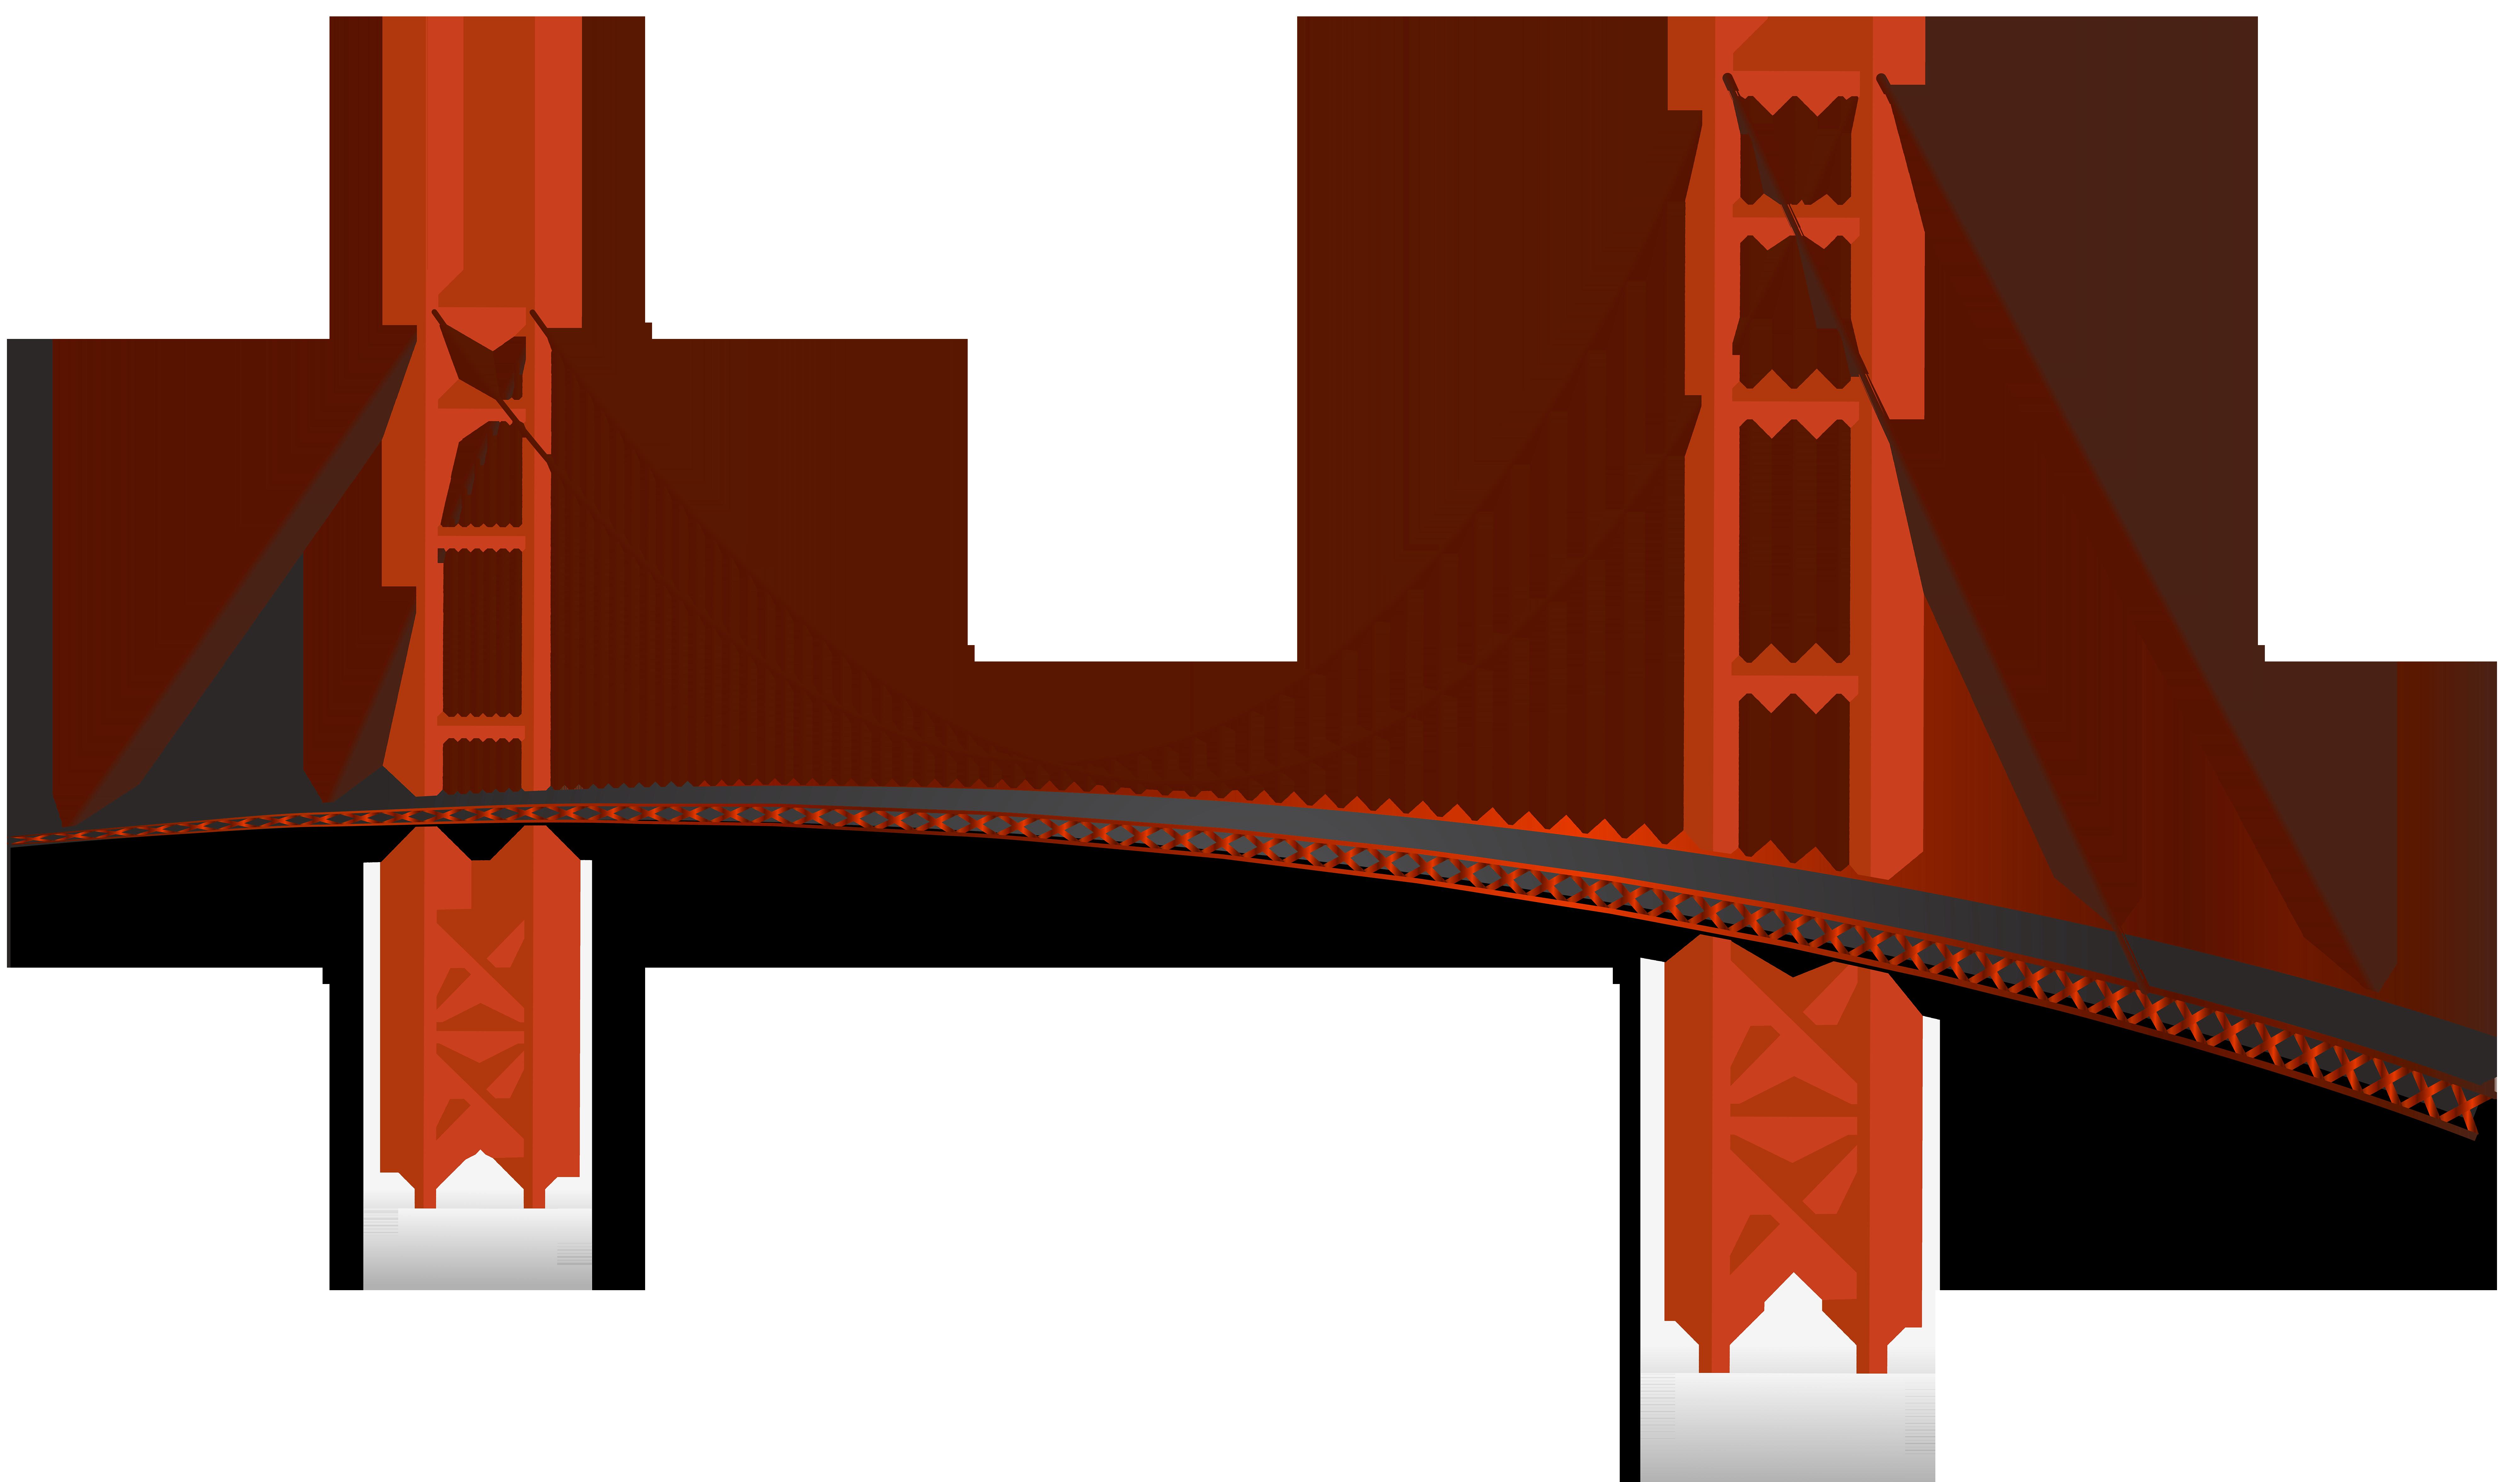 Rope bridge clipart clipart black and white library Golden Gate Bridge Nashik Clip art - tires clipart png ... clipart black and white library